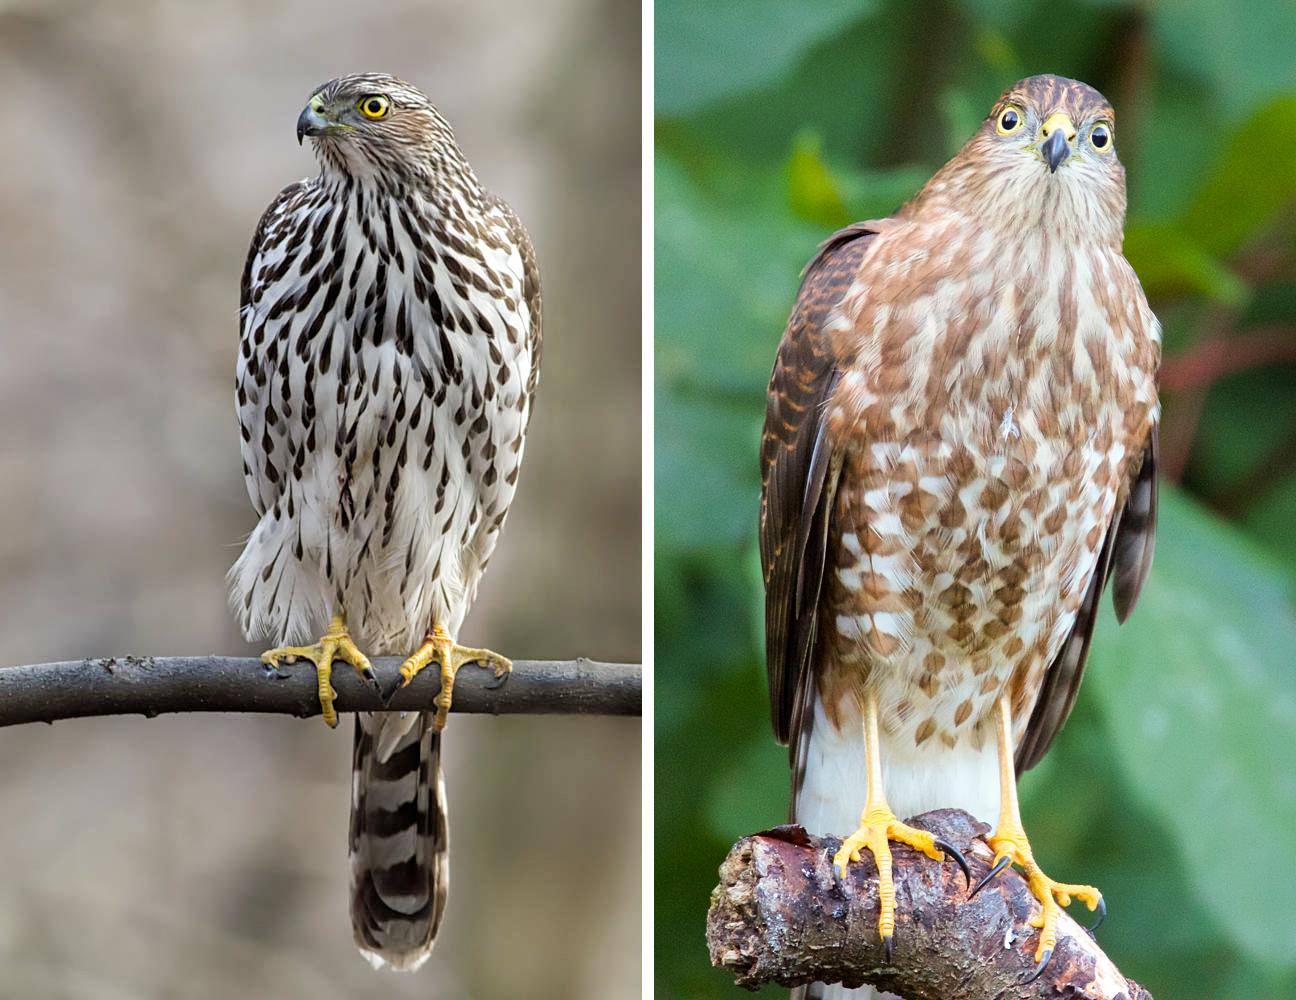 From left: Juvenile Cooper's Hawk. Photo: Sharron Crocker/Audubon Photography Awards; Juvenile Sharp-shinned Hawk. Photo: Jerry McFarland